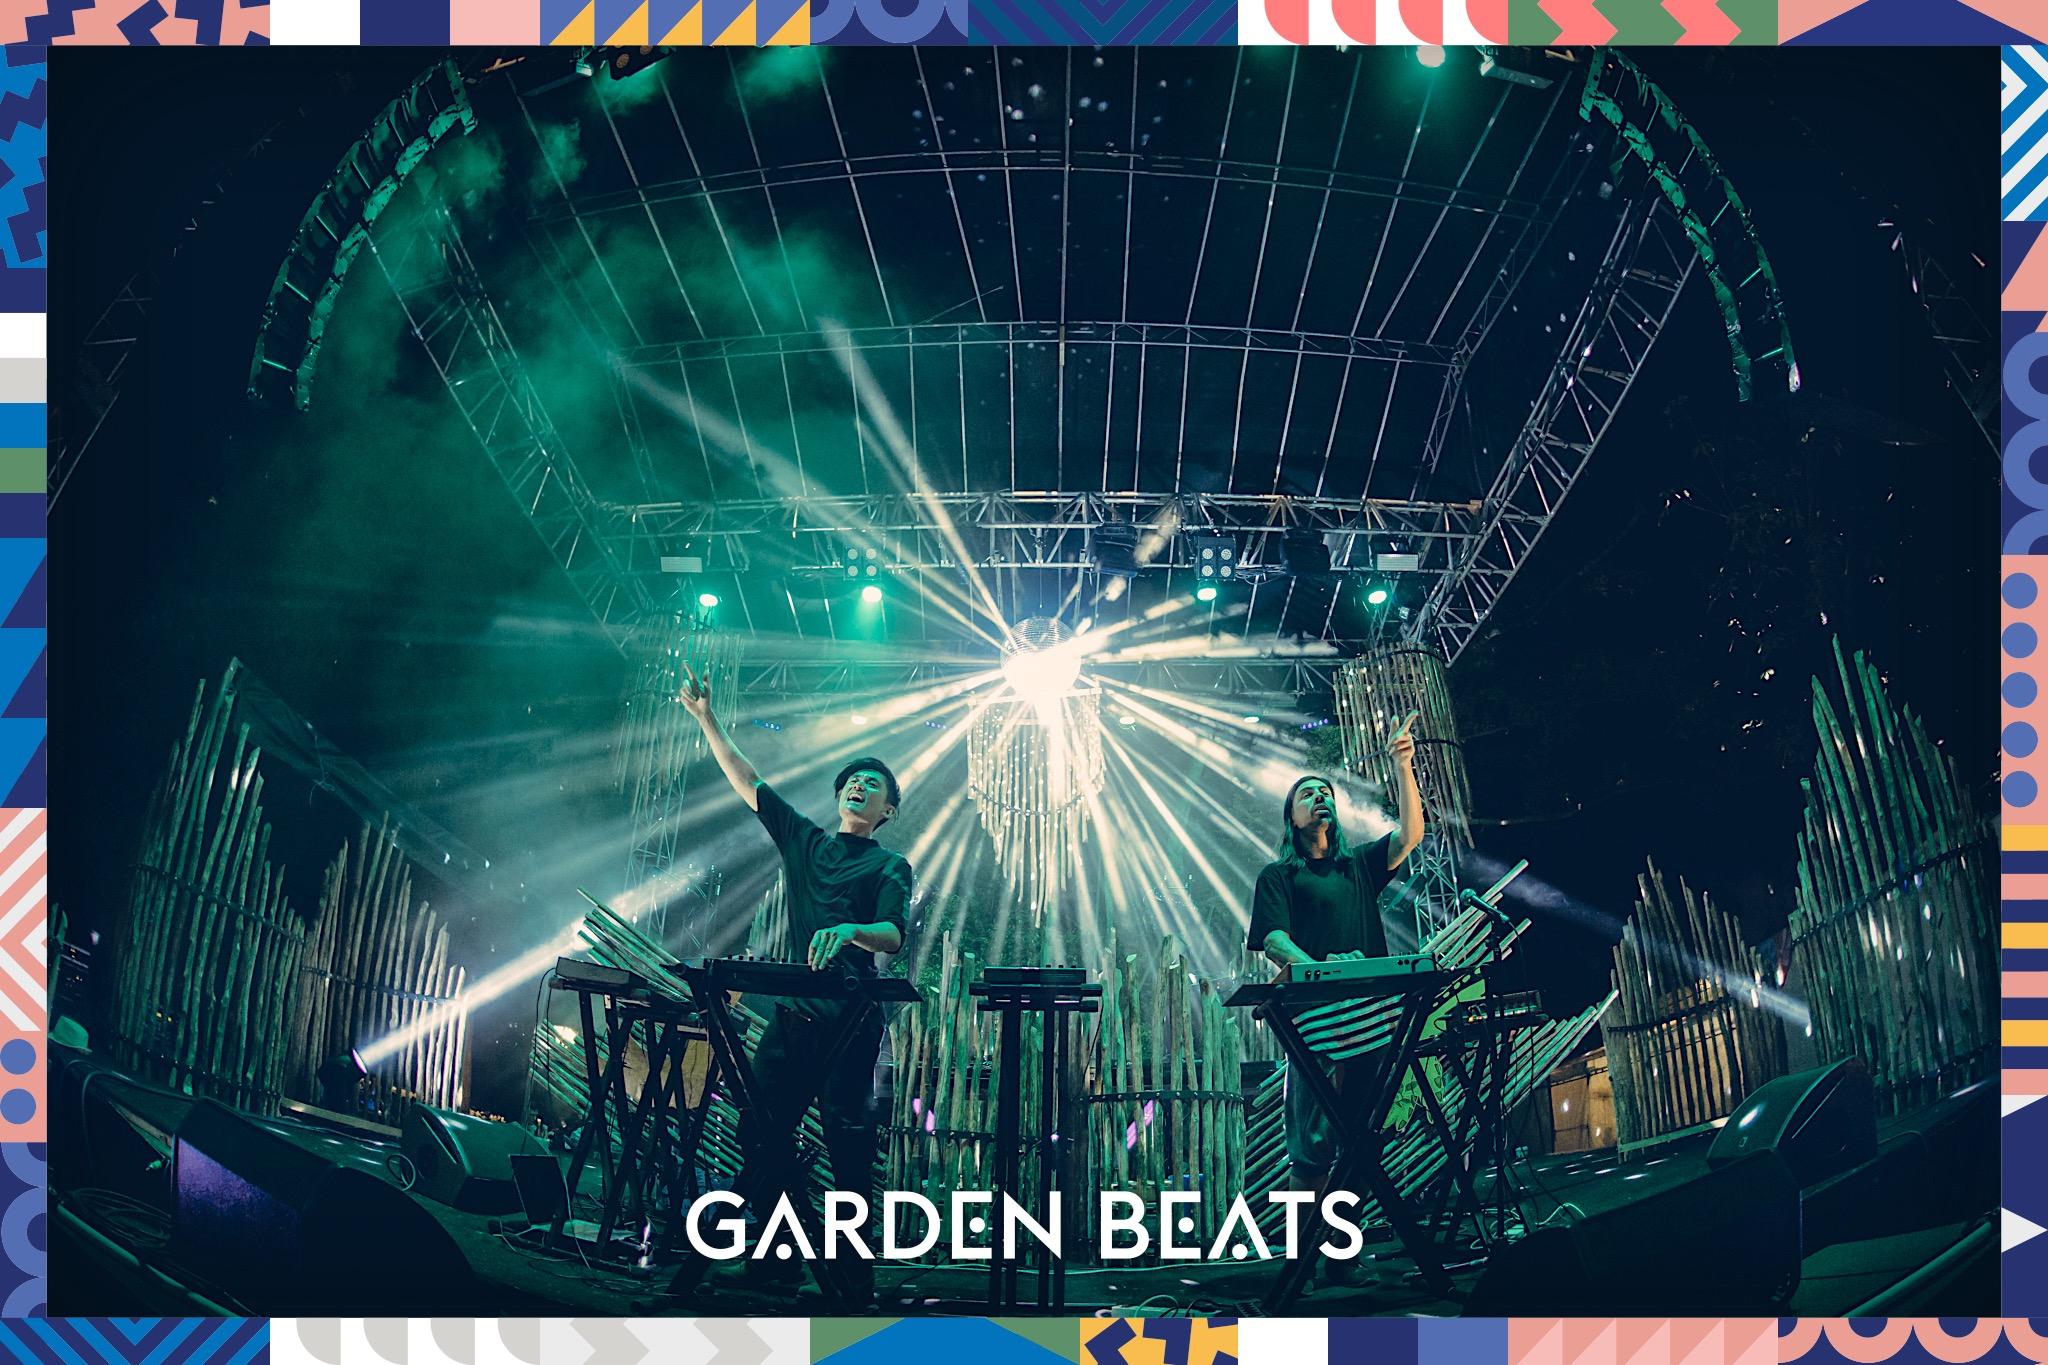 18032017_GardenBeats_Colossal775_WatermarkedGB.jpg